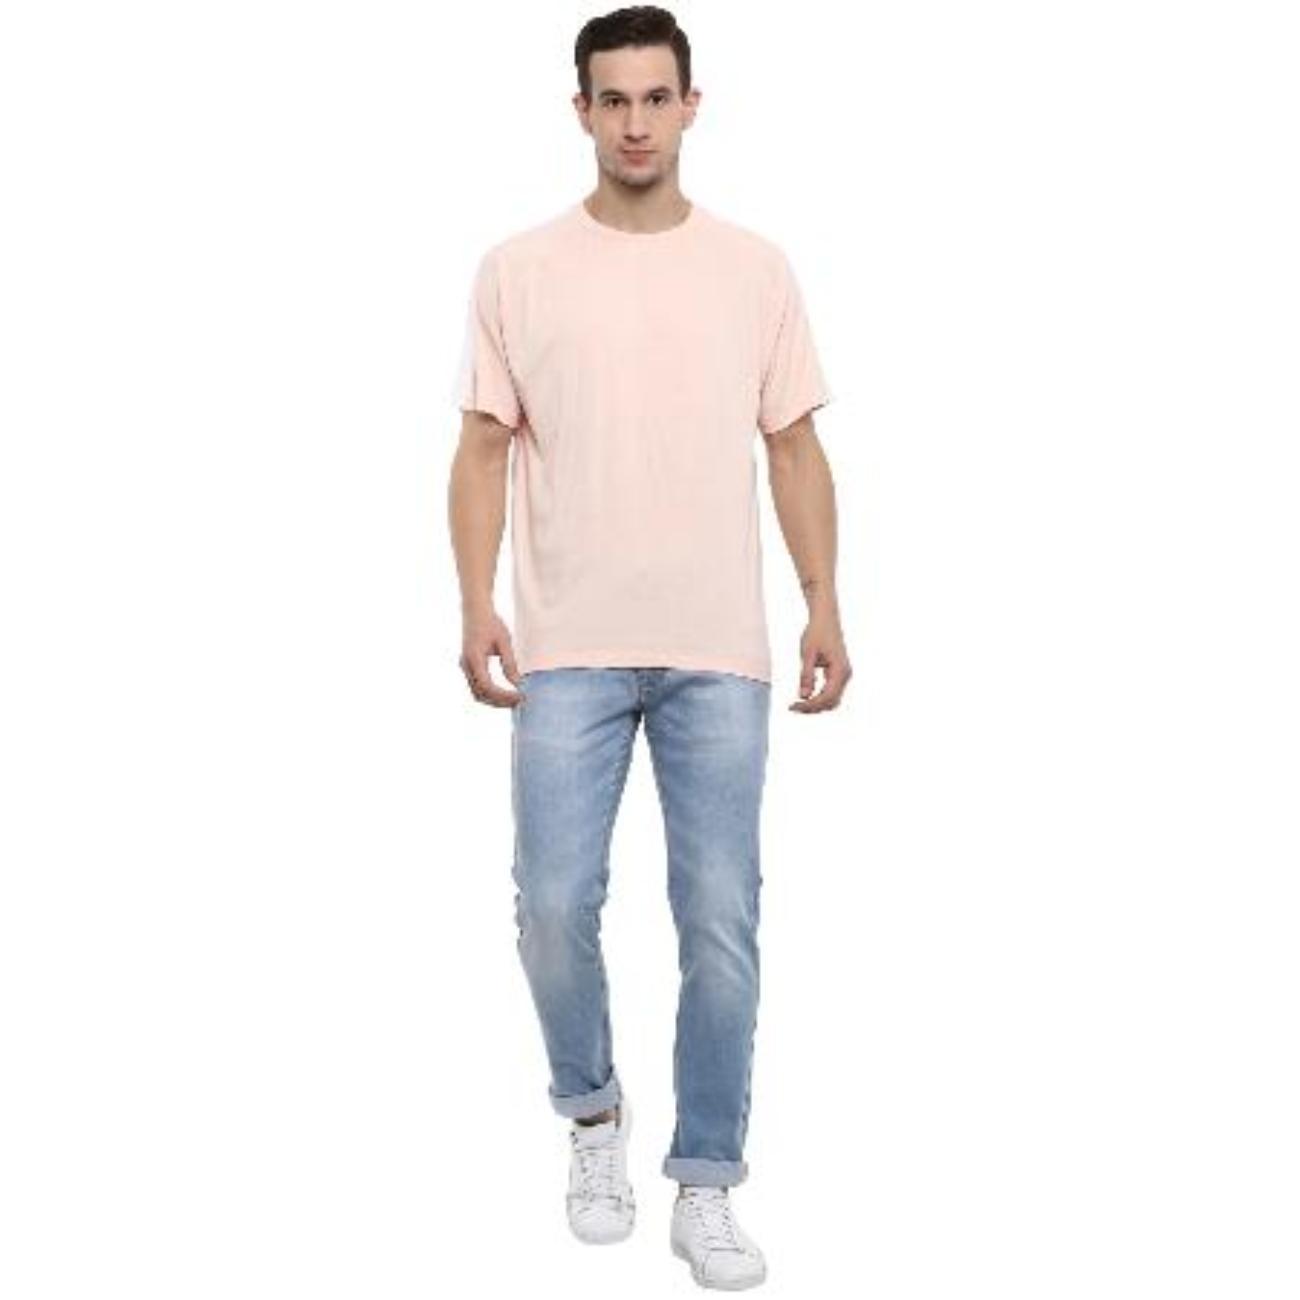 Mens LIght Pink Color TShirts